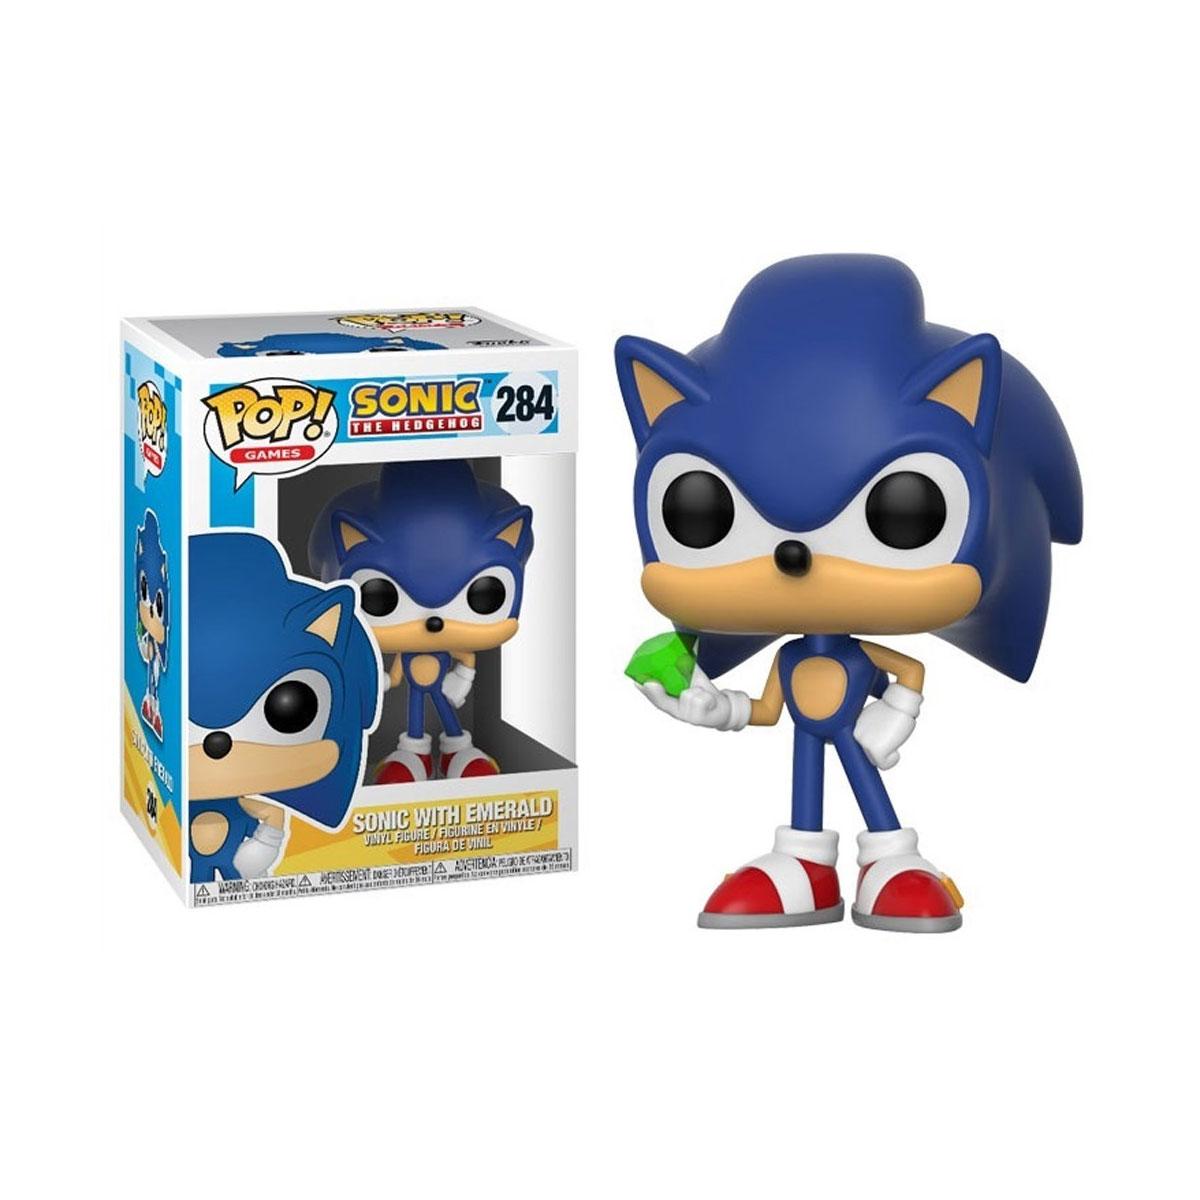 Funko Pop Sonic com Esmeralda 284 Sonic The Hedgehog